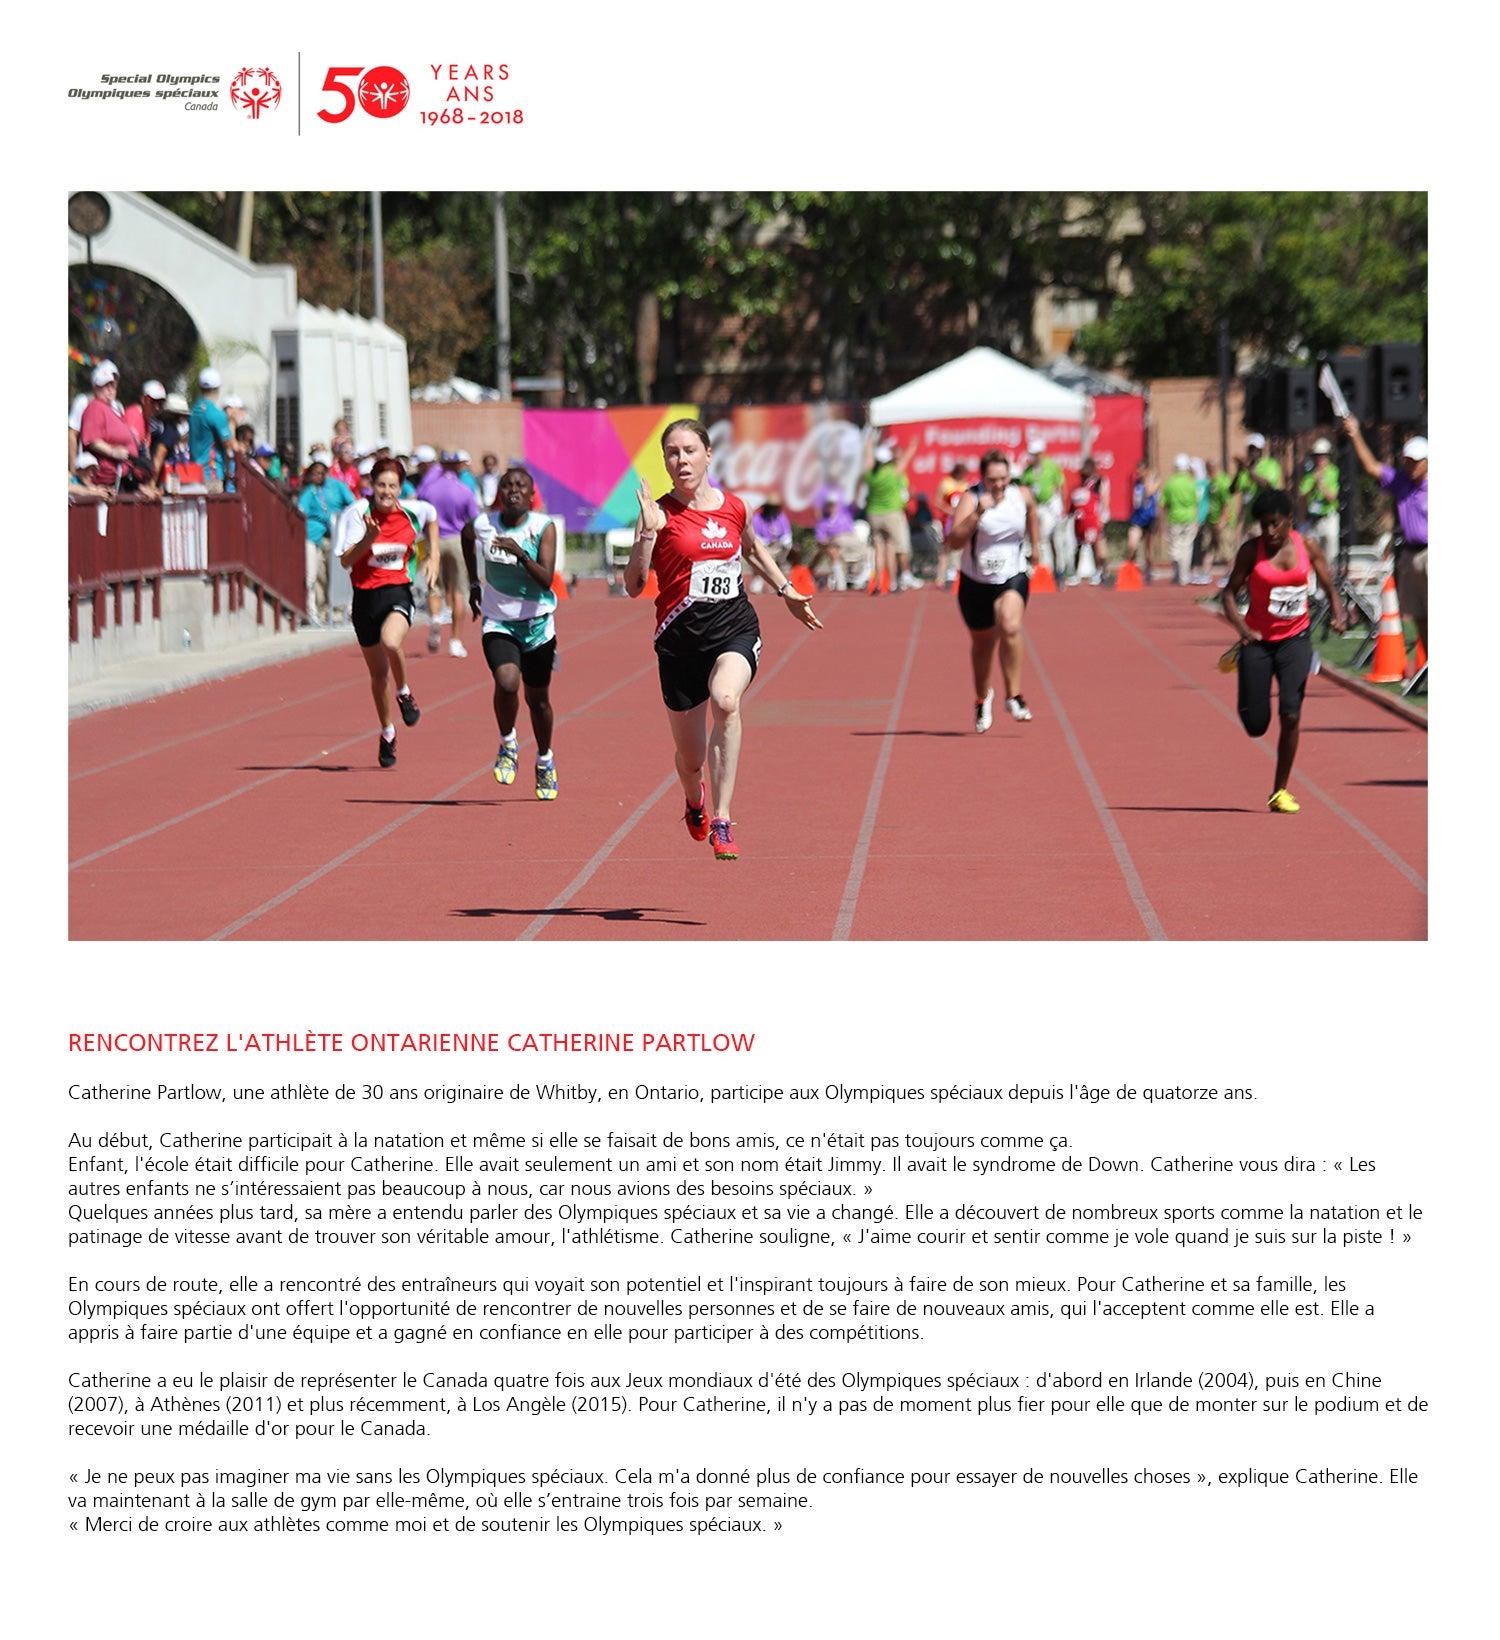 JYSK Sponsors Special Olympics